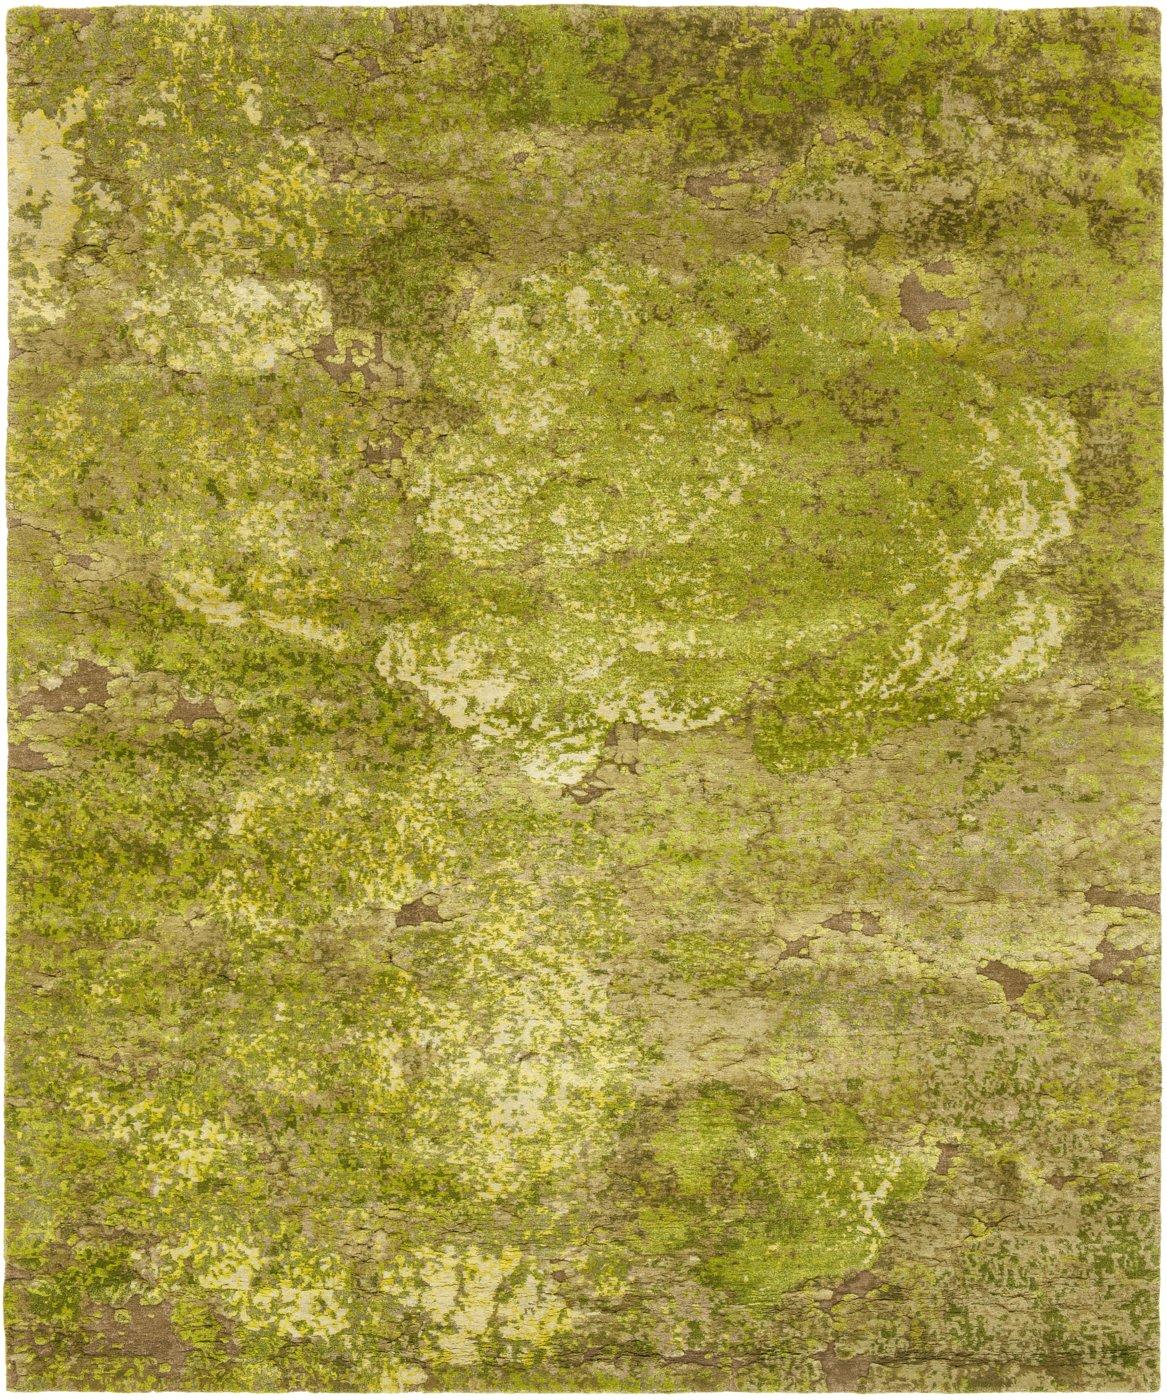 Aerial Forest, Jan Kath